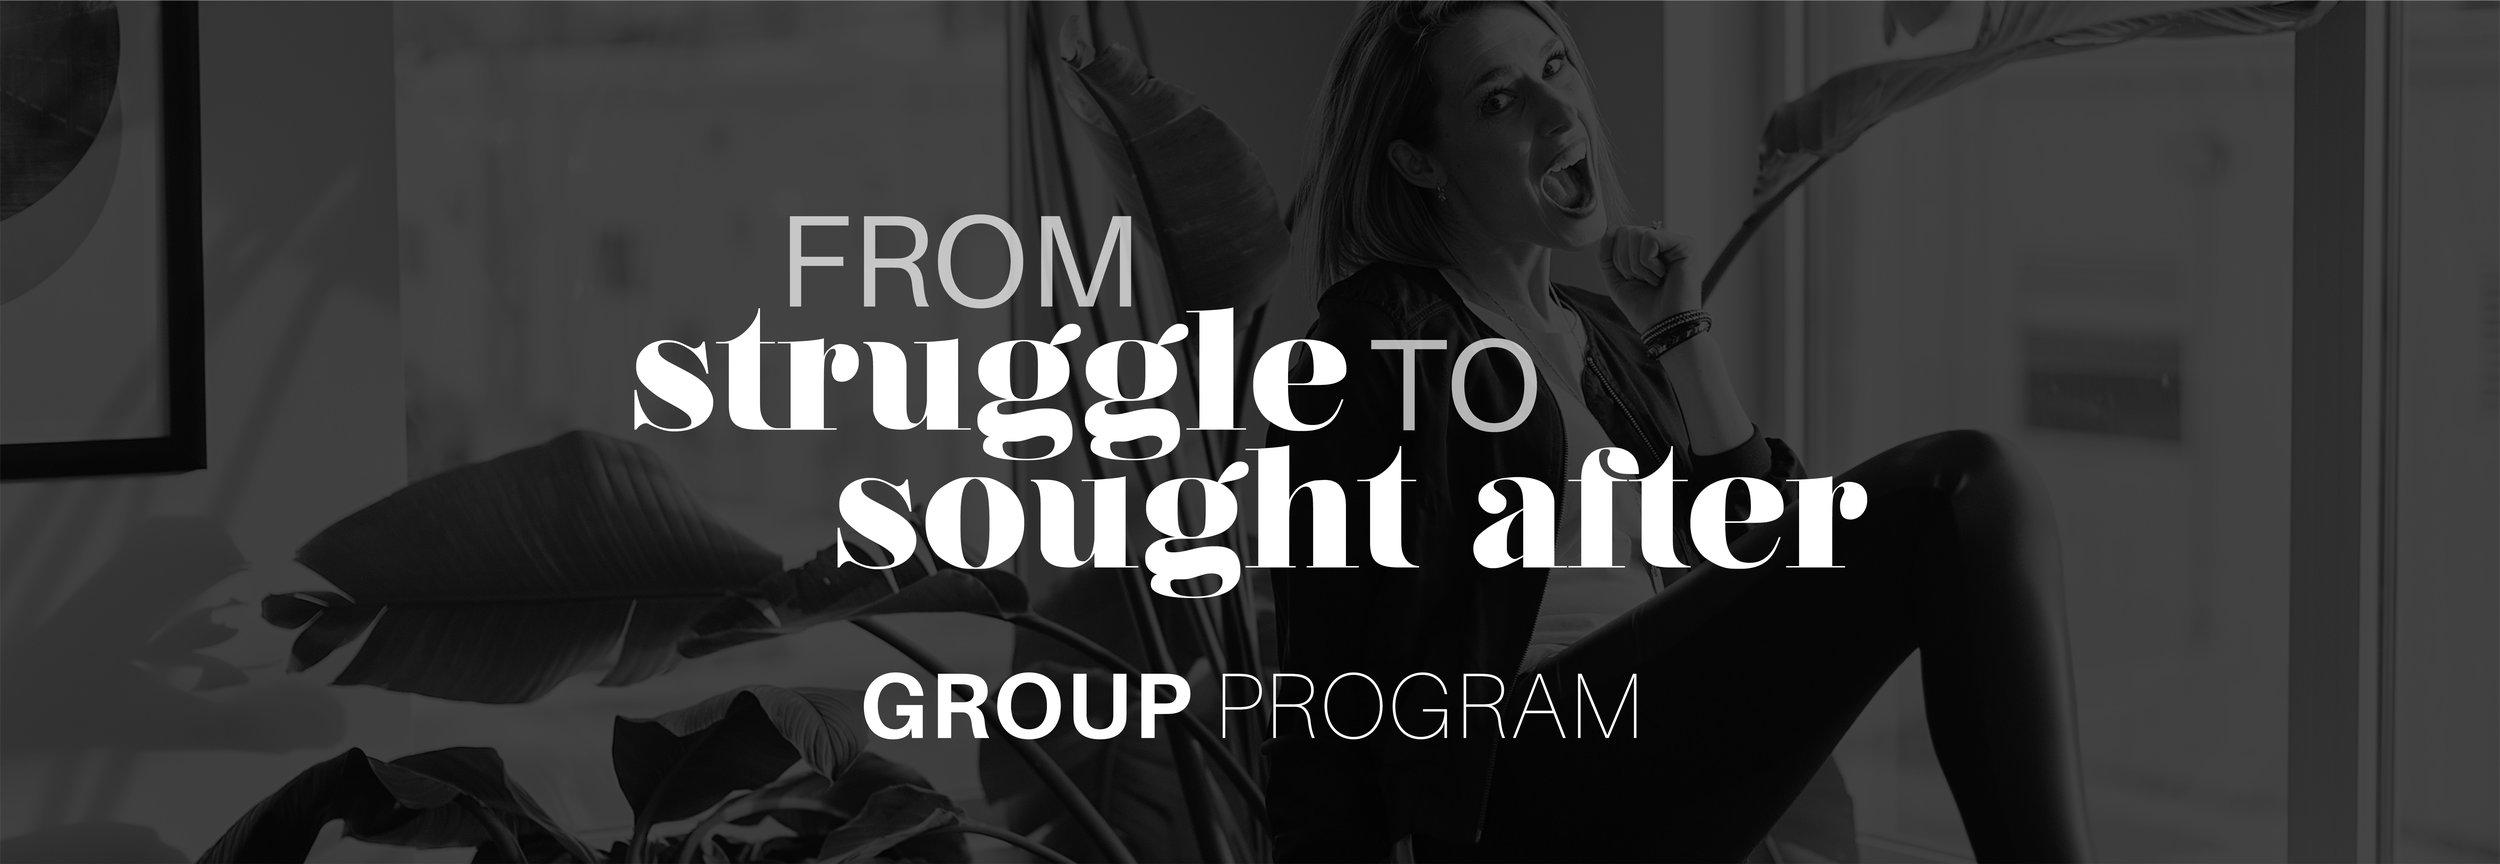 GROUP_struggle to sought after banner.jpg